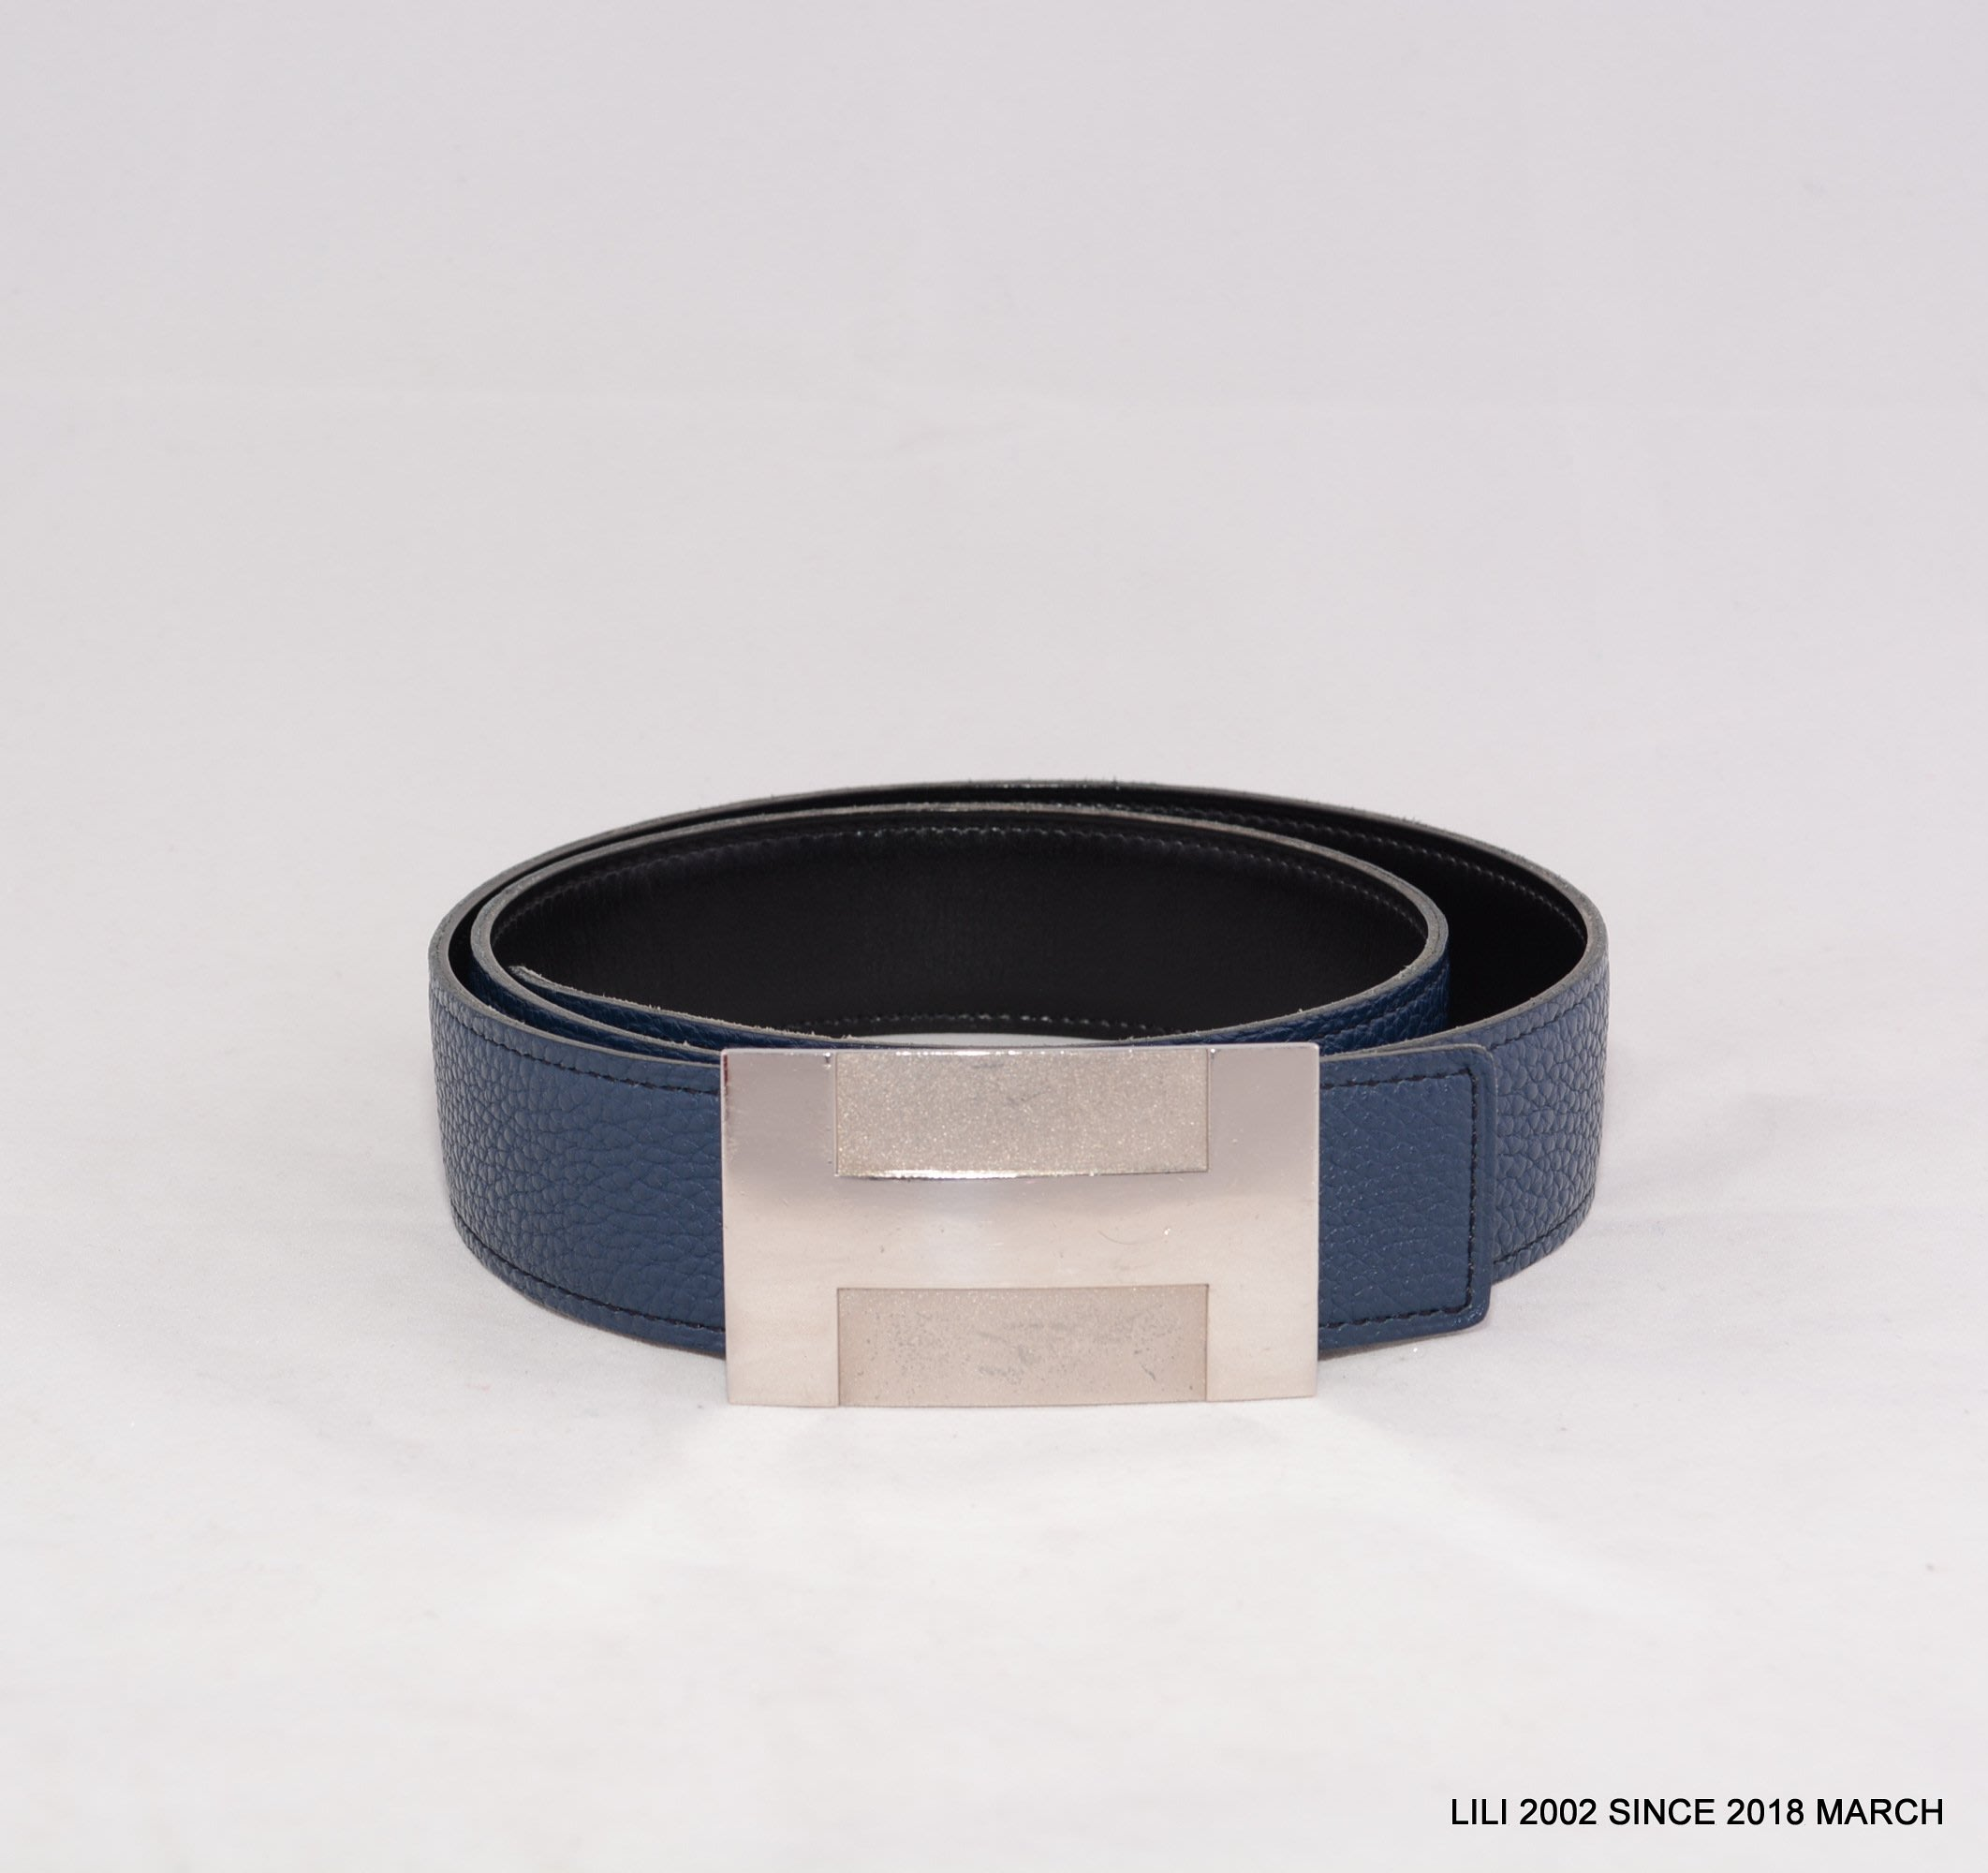 [LiLi二手精品] 真品 HERMES 銀色H頭藍色皮帶~ 9成新